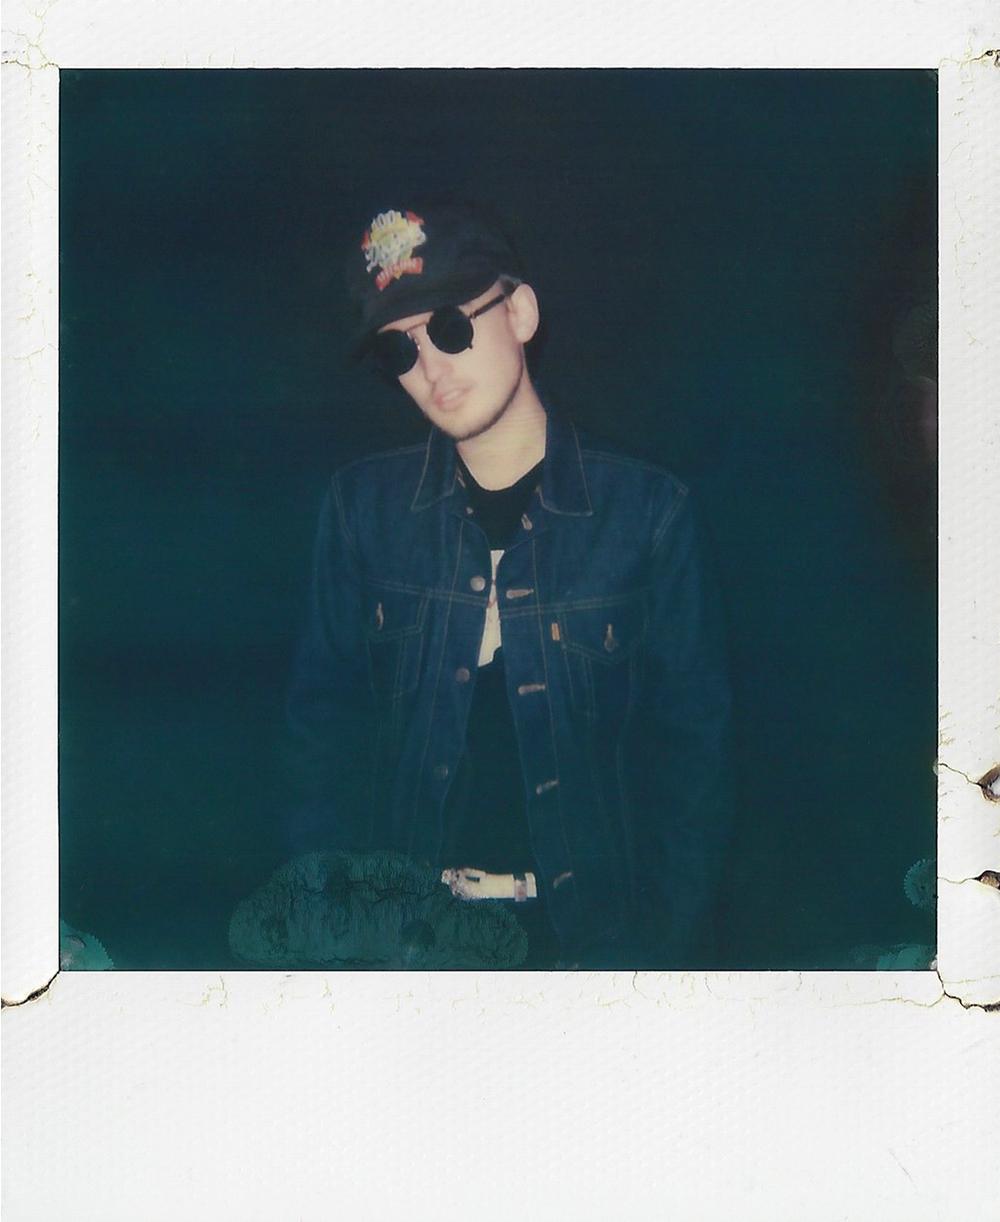 Garrett-Color-Polaroid-casenruiz.jpg